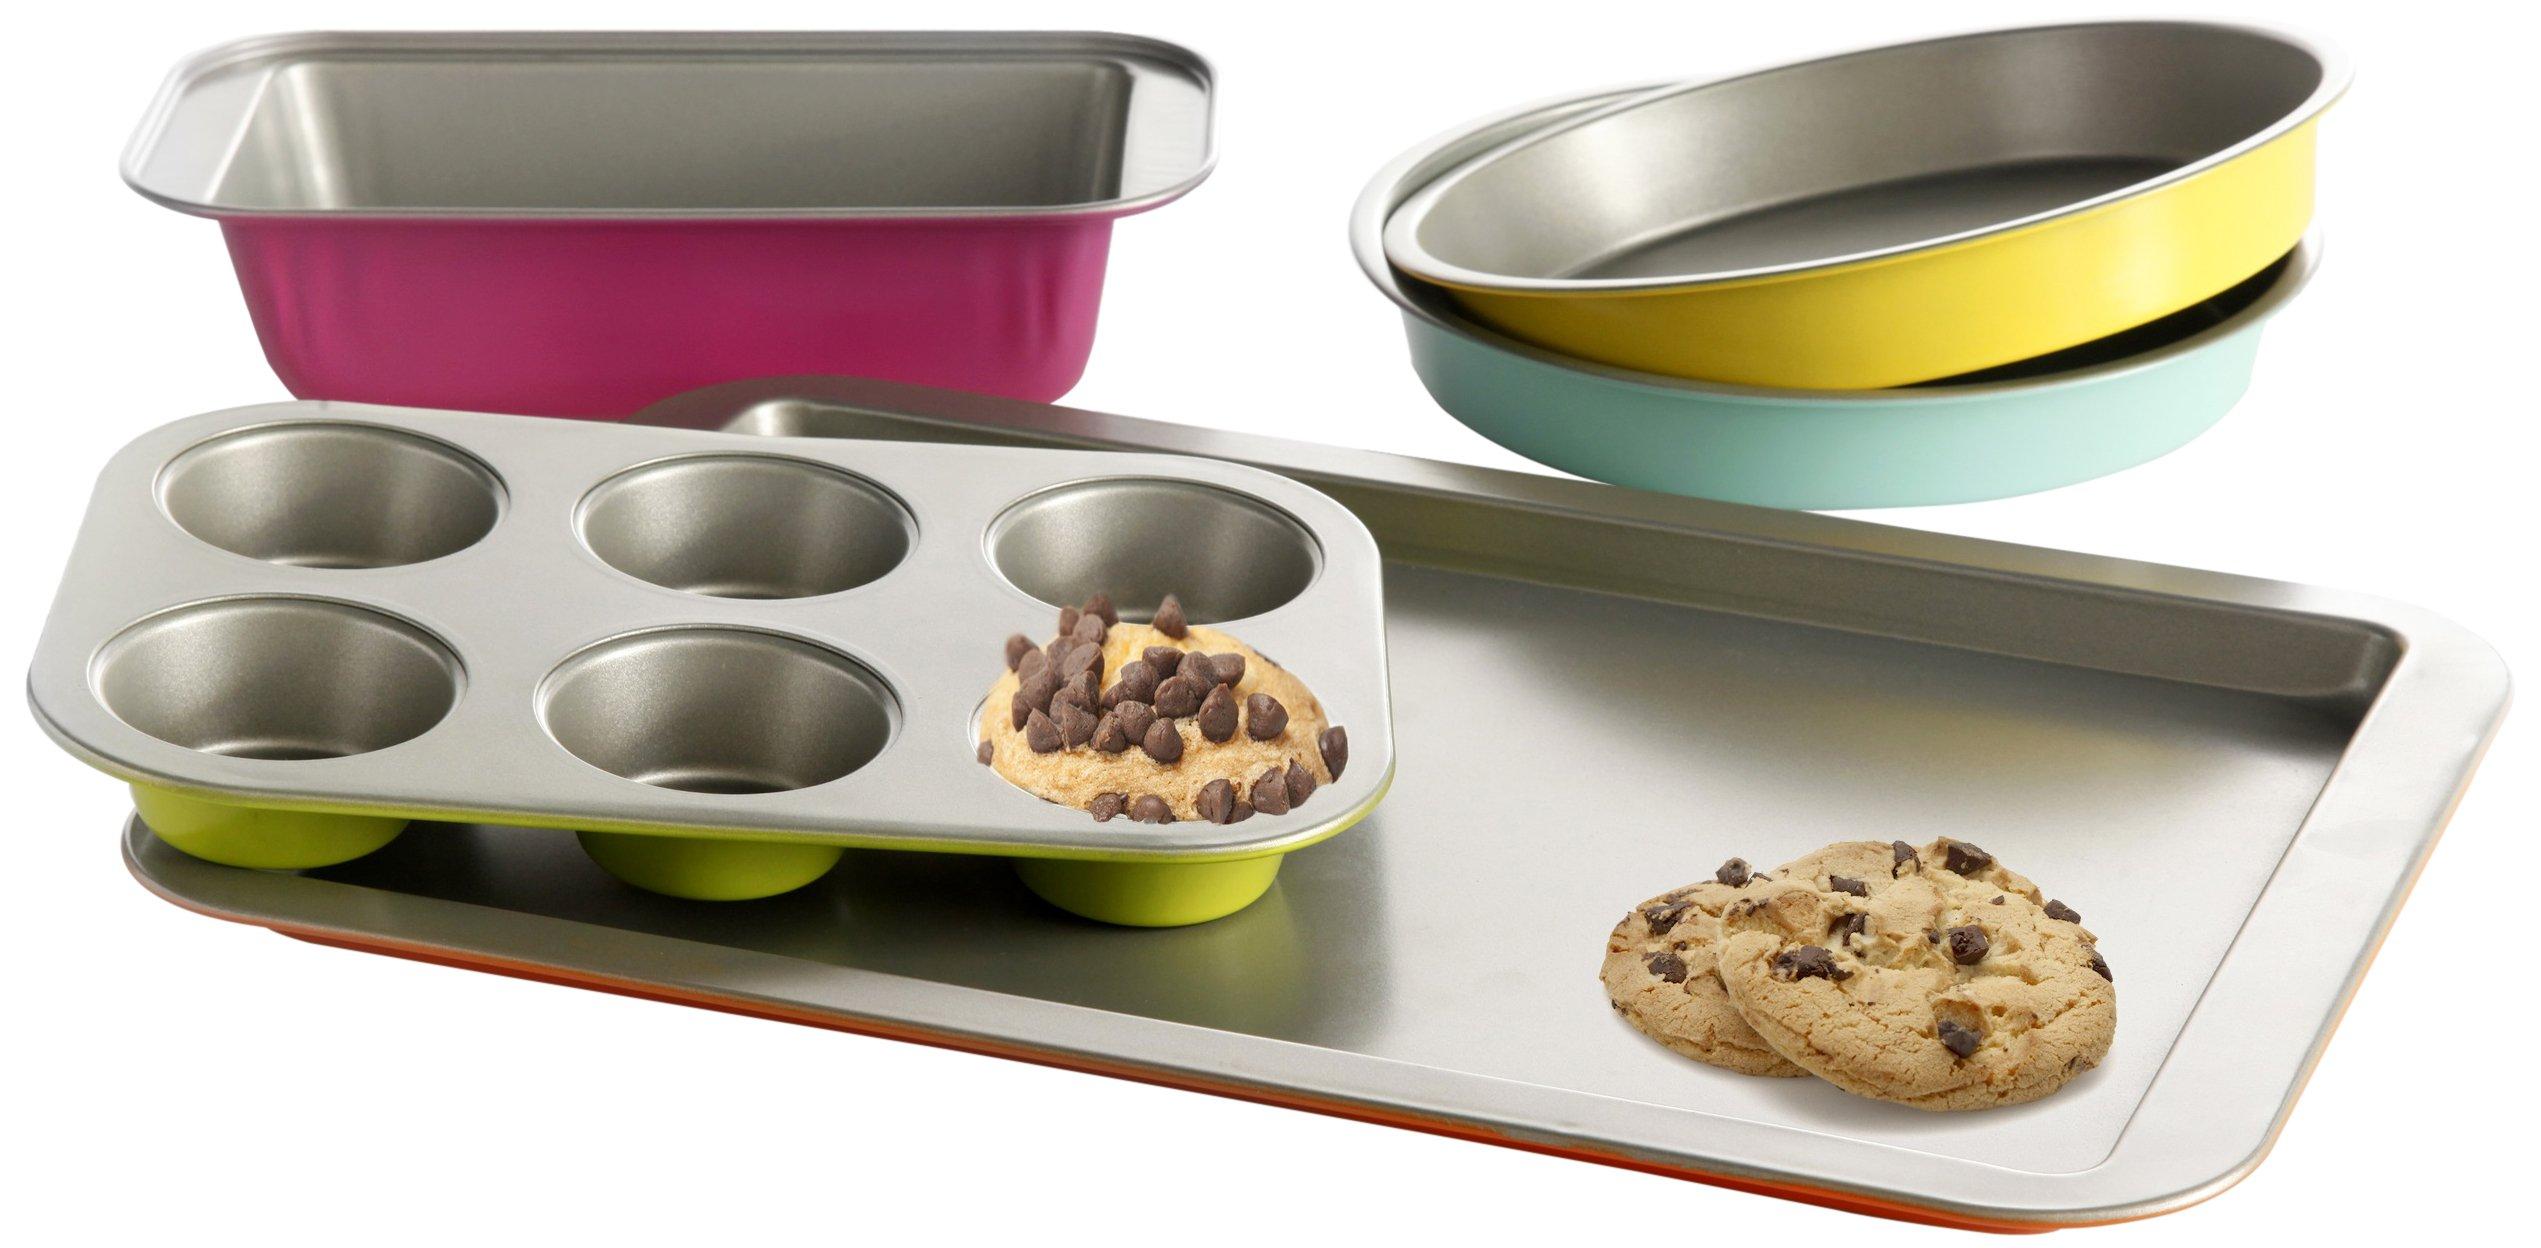 Gibson Home ColorSplash Lyneham 5 Piece Carbon Steel Bakeware Set, Gray